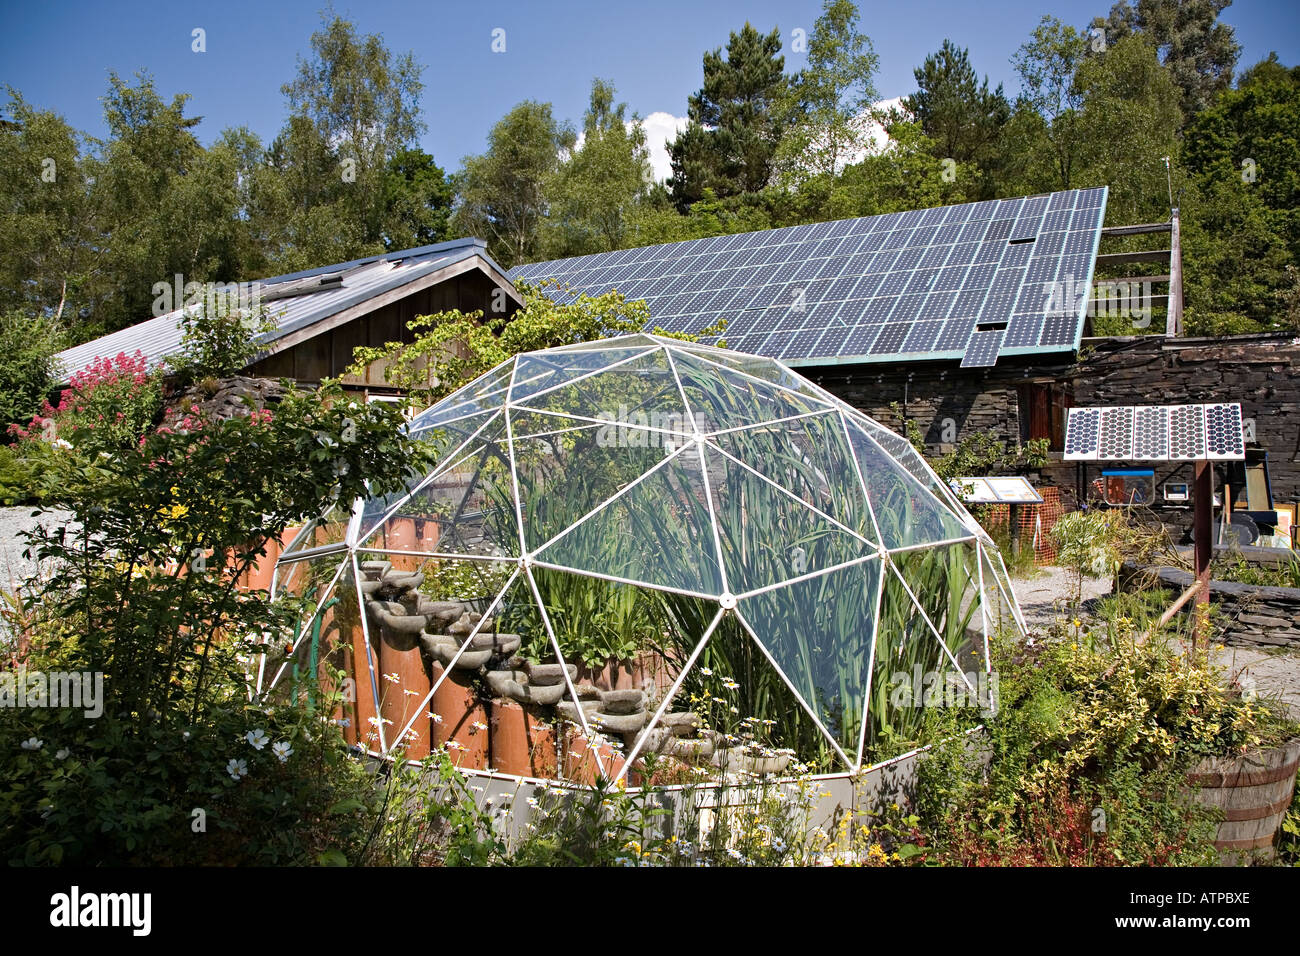 solar systems ahaped dome - photo #8